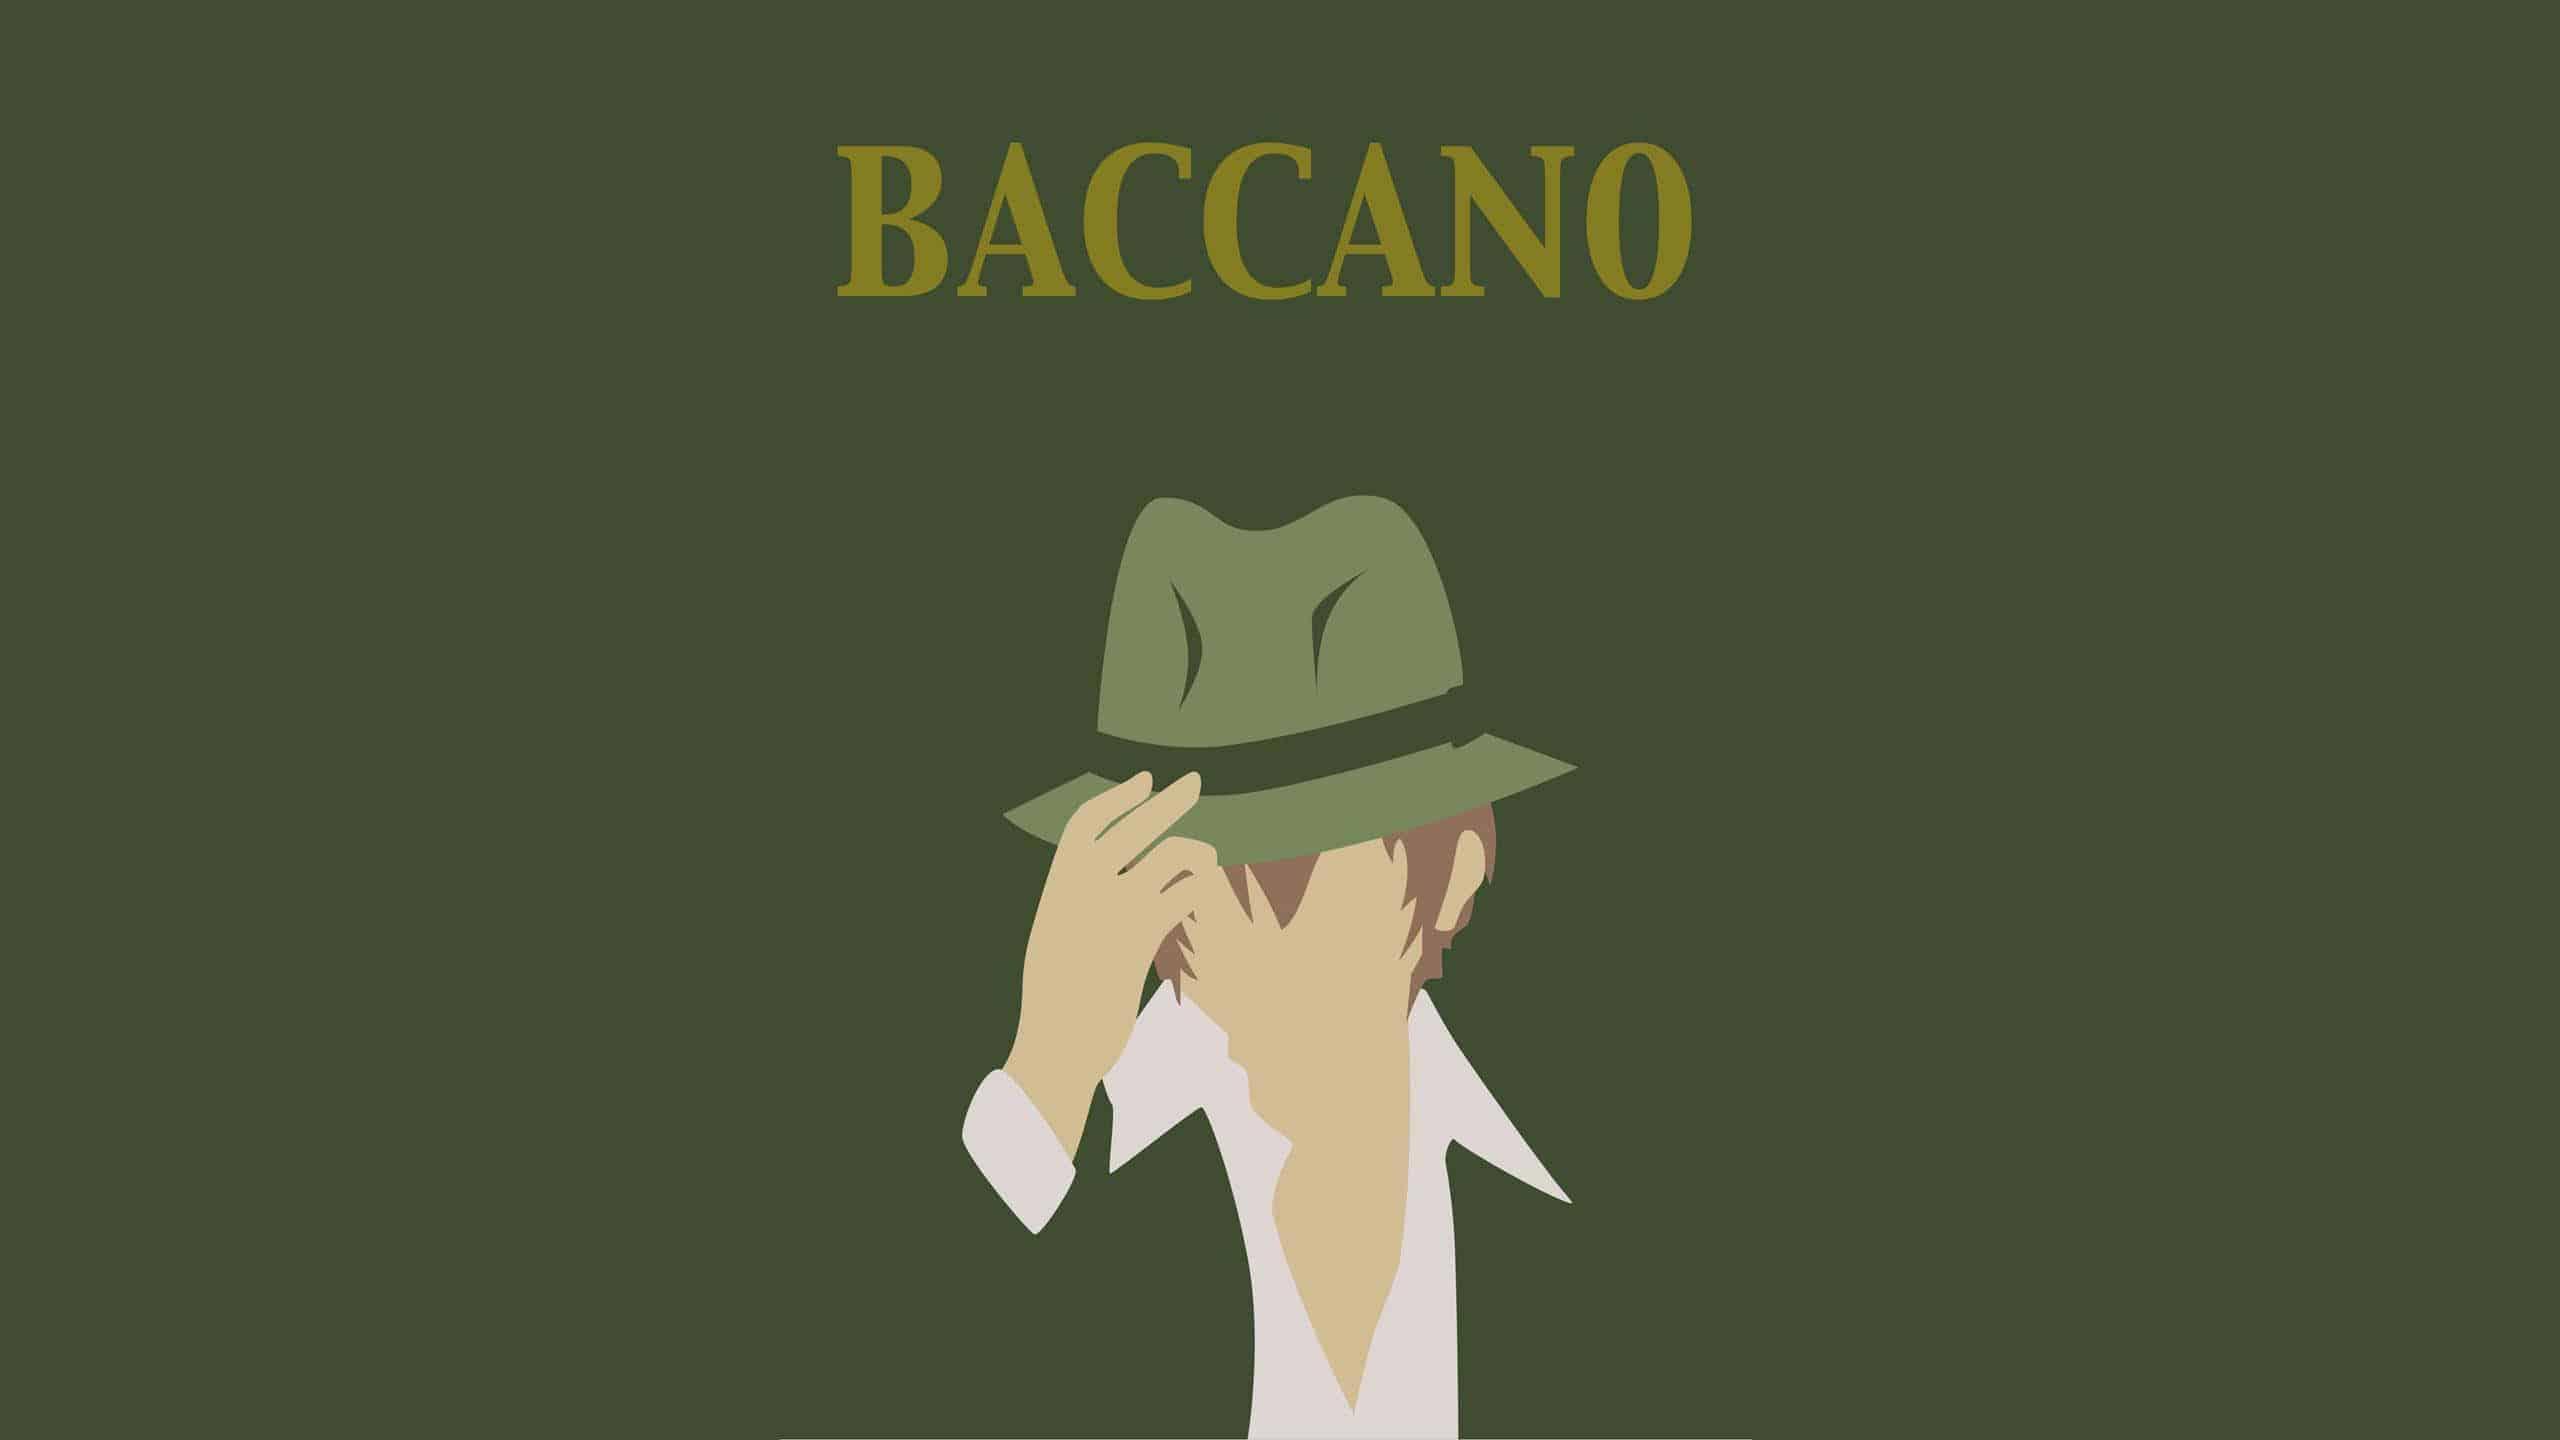 baccano wqhd 1440p wallpaper